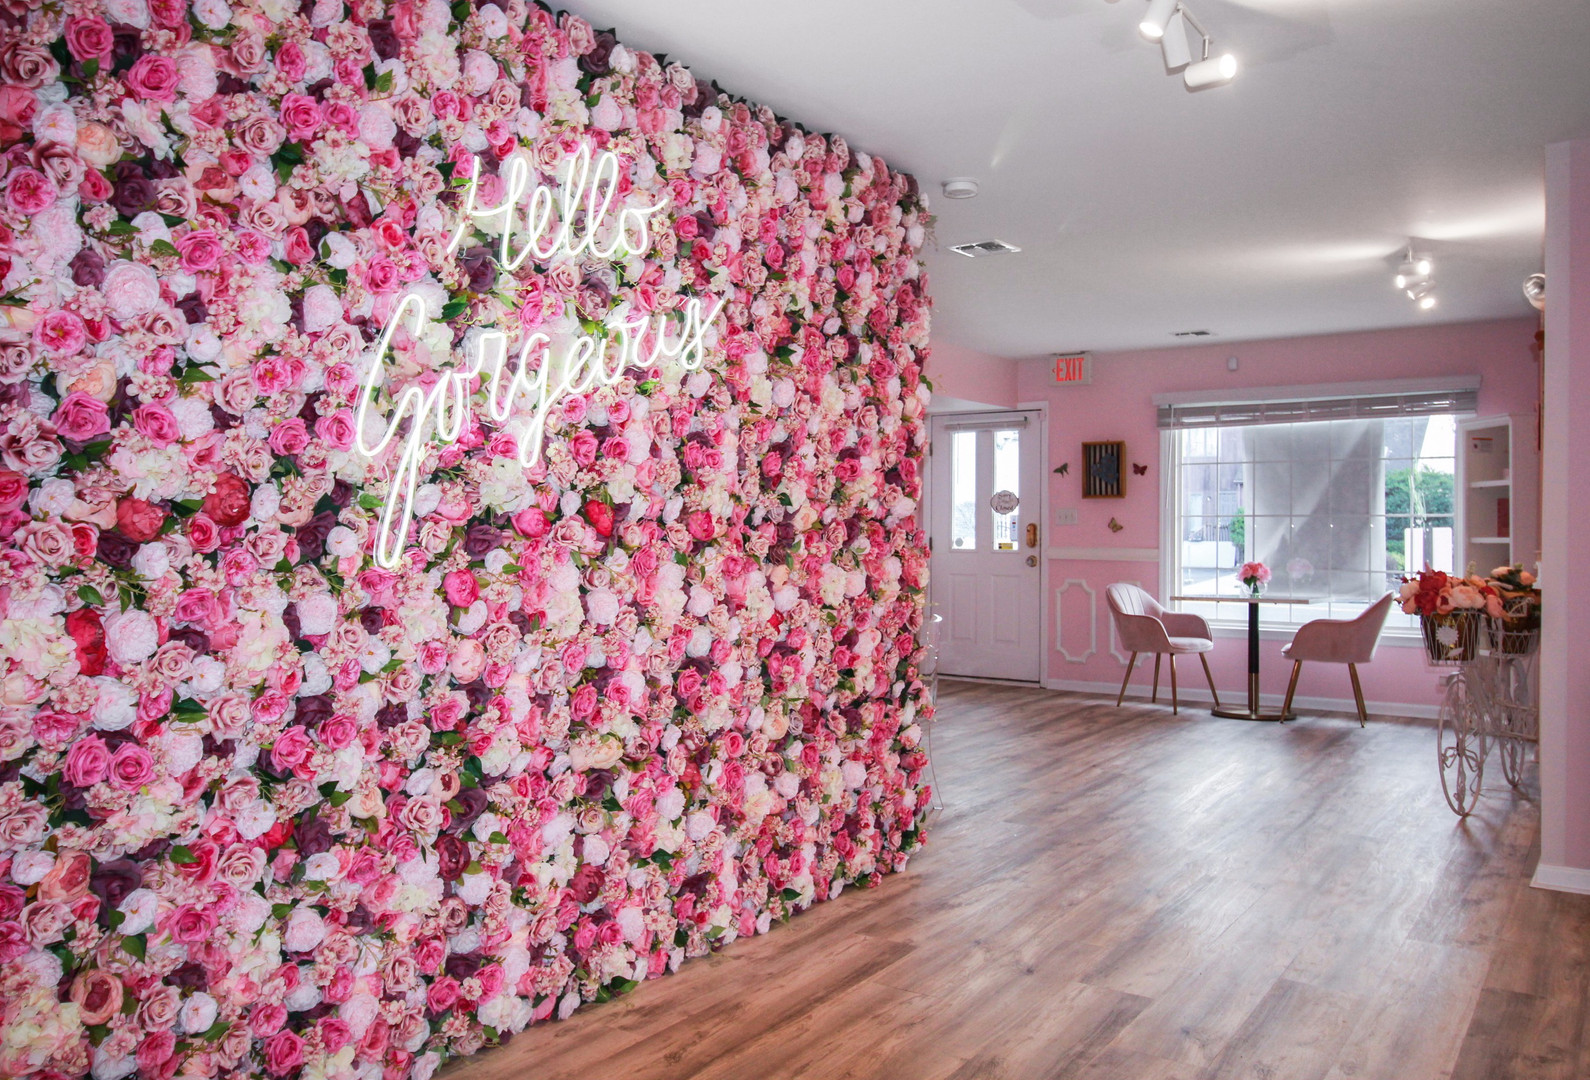 Flower Wall at Pinkies